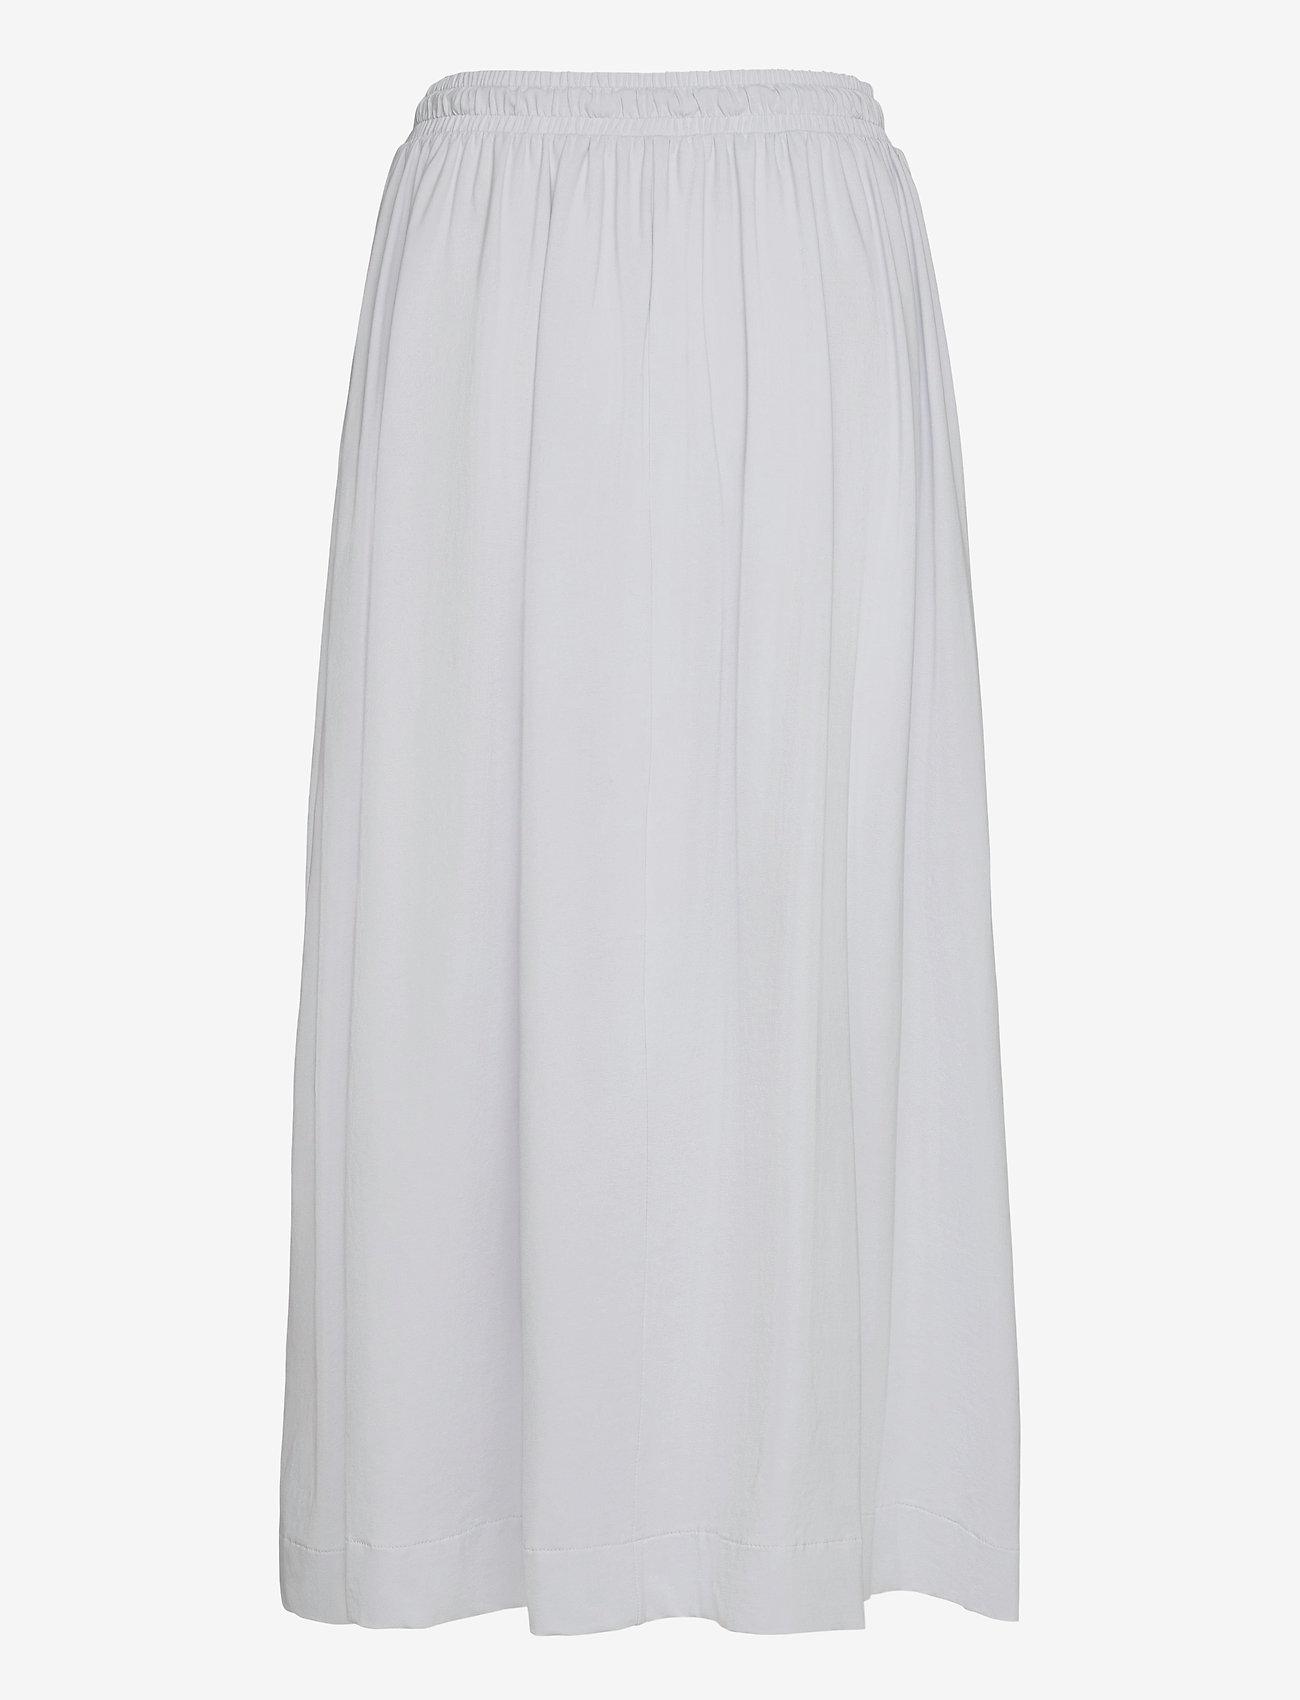 Max Mara Leisure - RADAR - midi skirts - light grey - 1